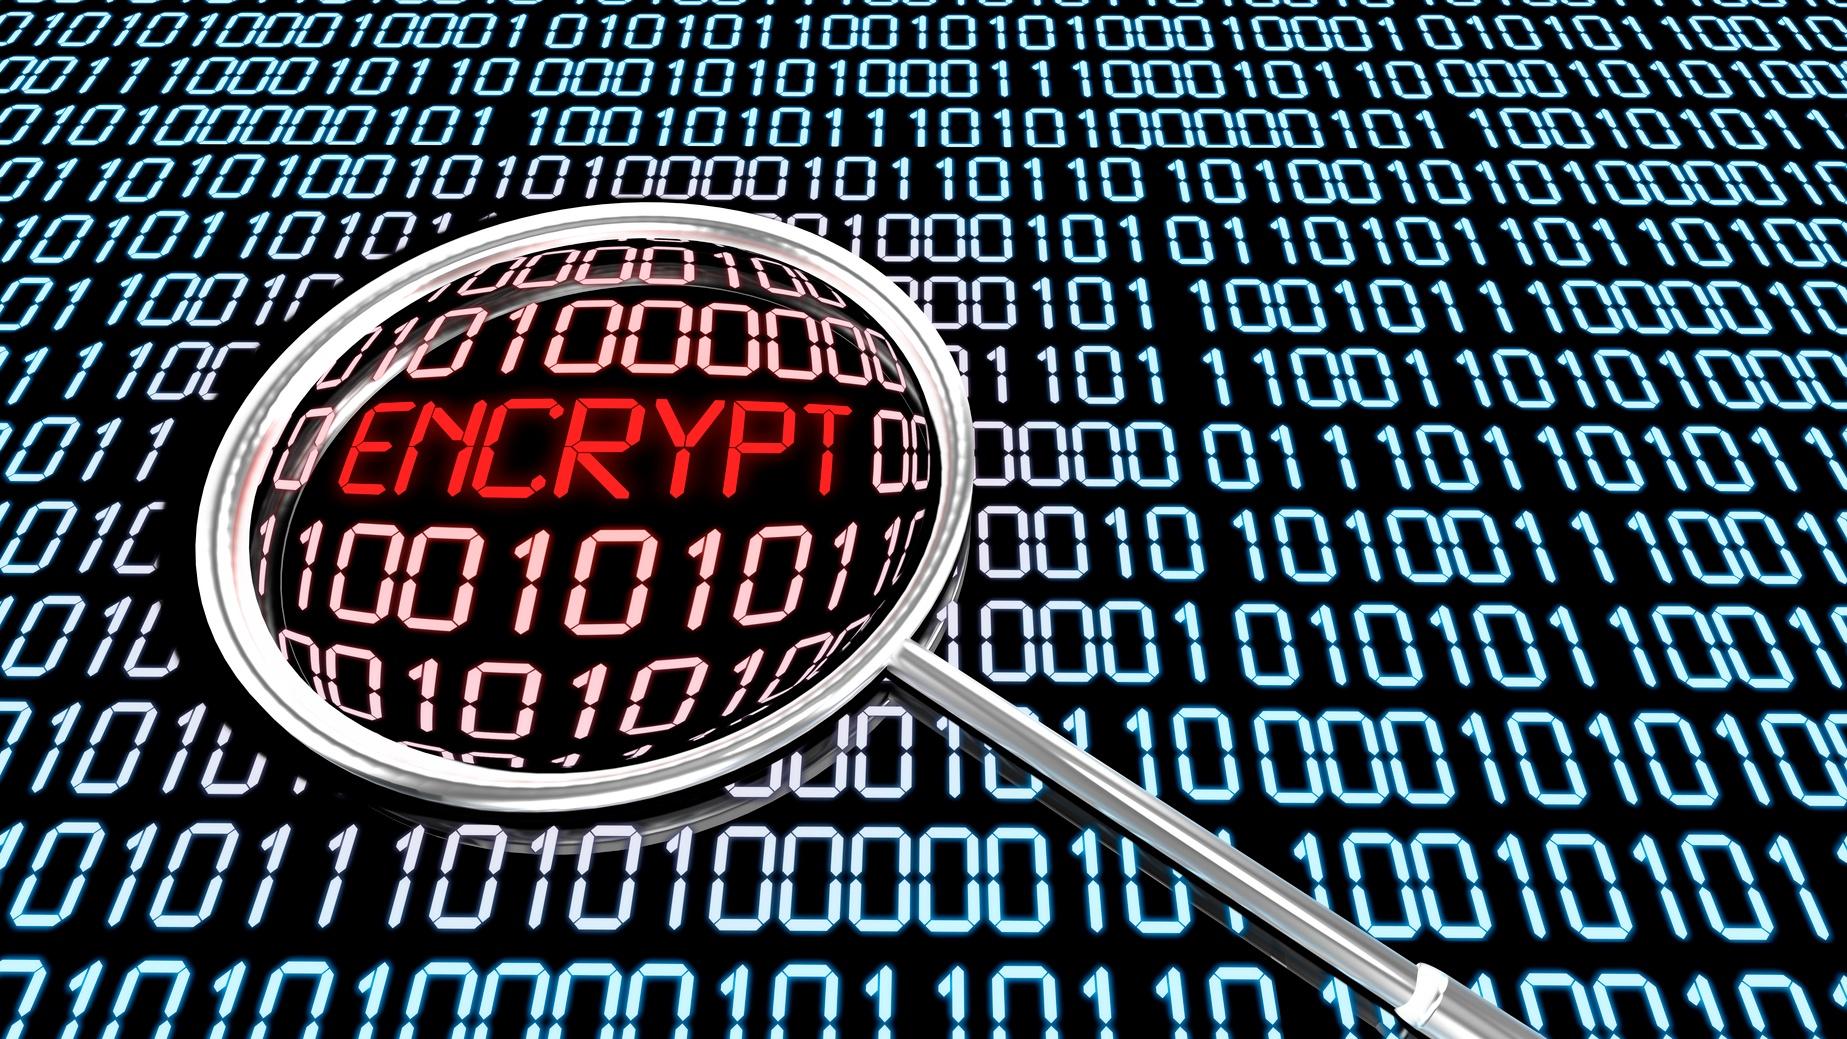 Hard_drive_encryption_.jpg